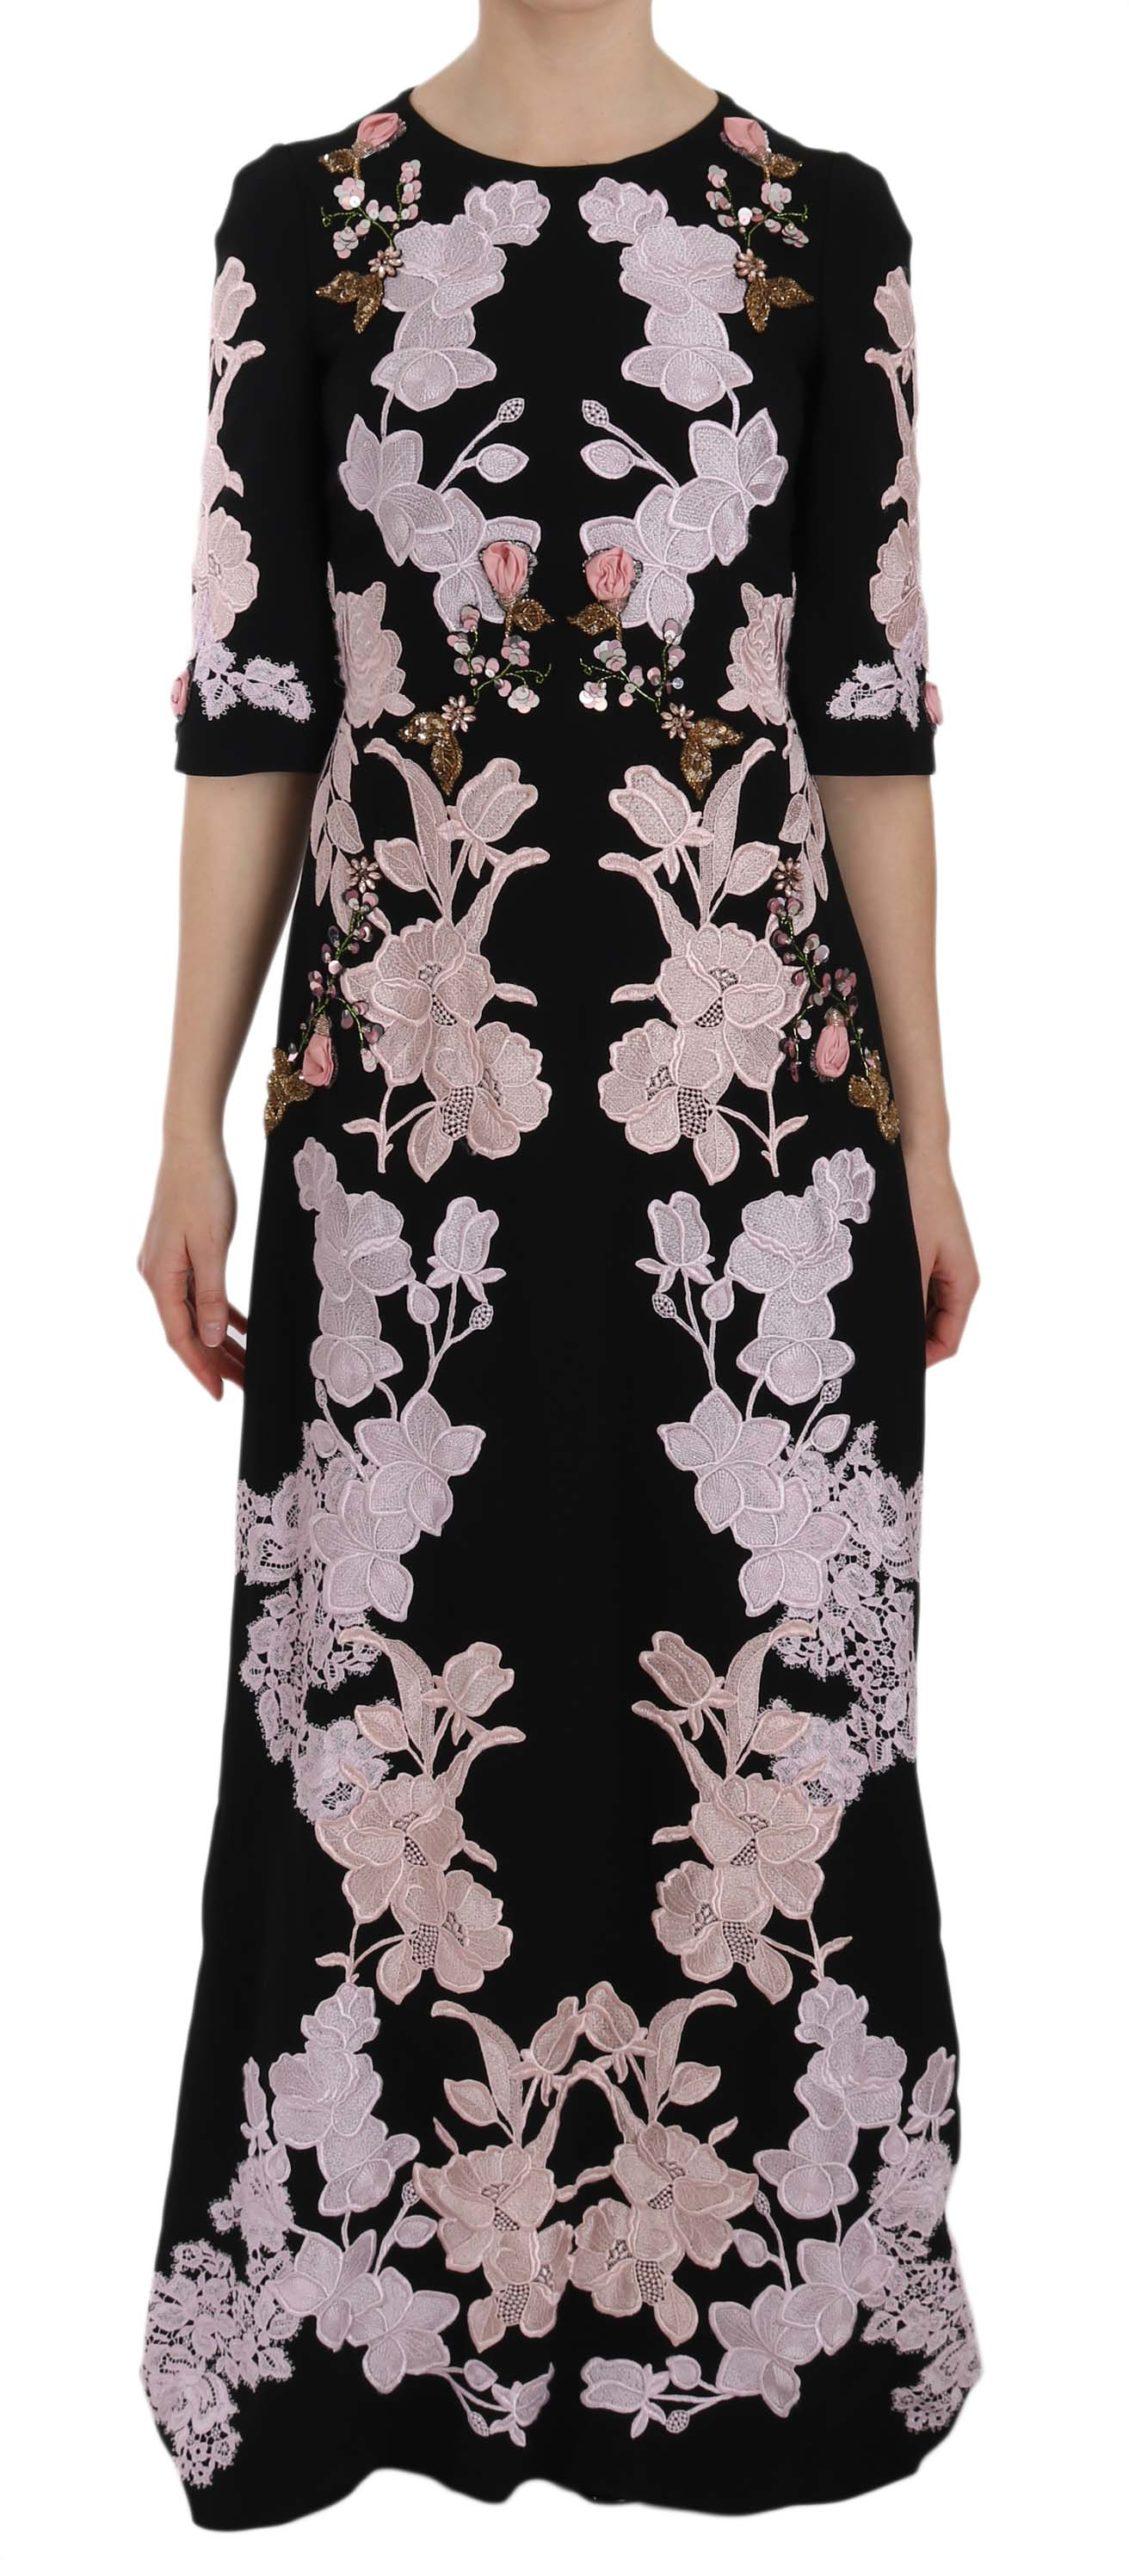 Dolce & Gabbana Women's Floral Lace Crystal Dress Black DR1660 - IT40|S